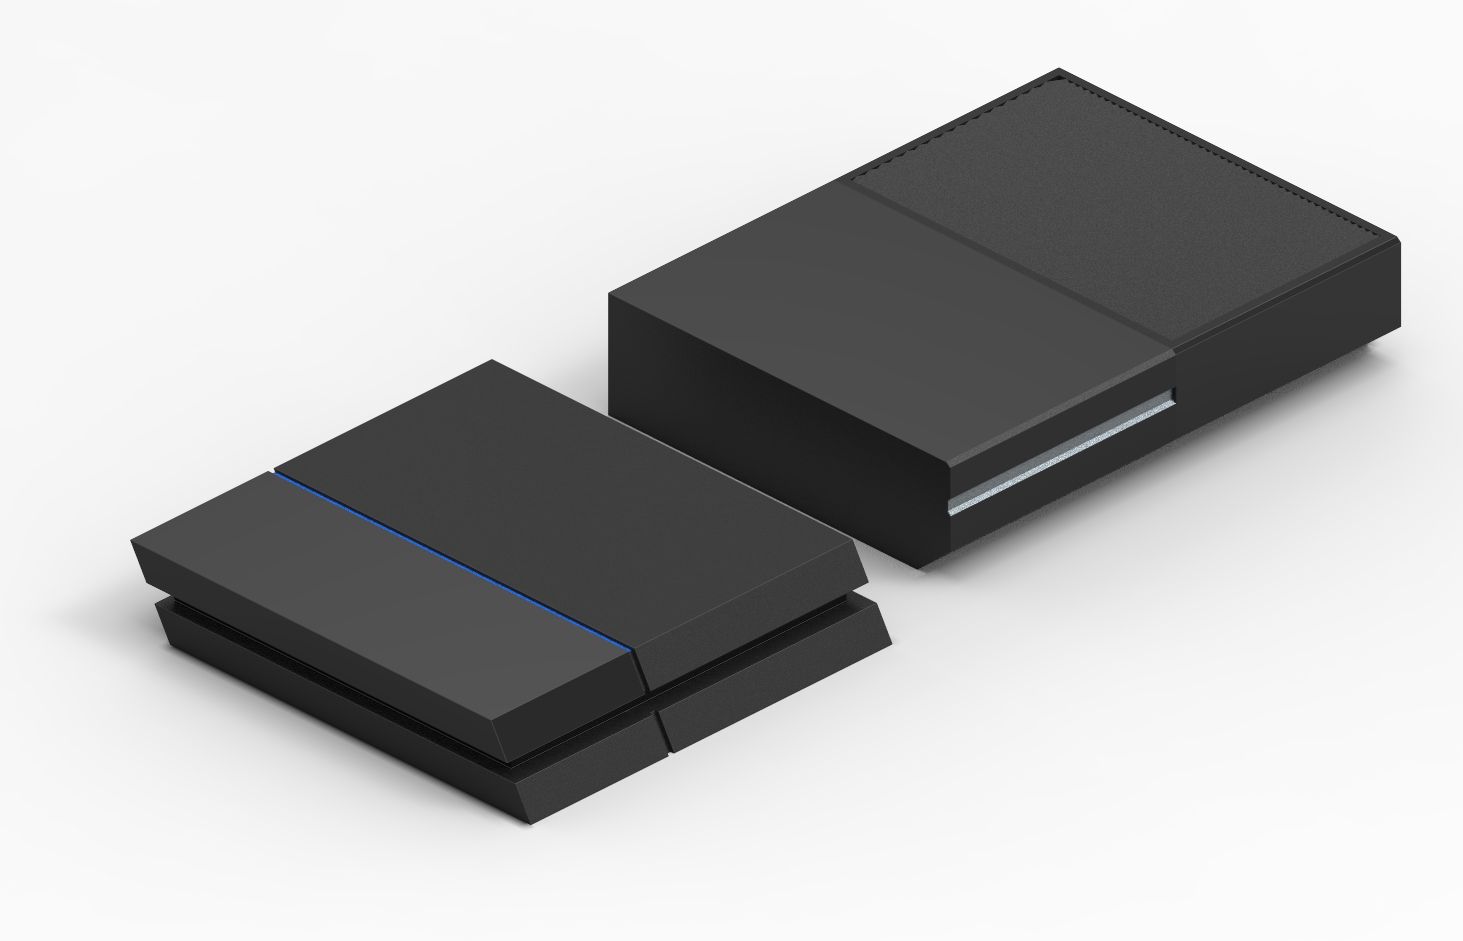 Ps4 vs xbox one console size comparison gamingreality - Meilleur console entre xbox one et ps4 ...